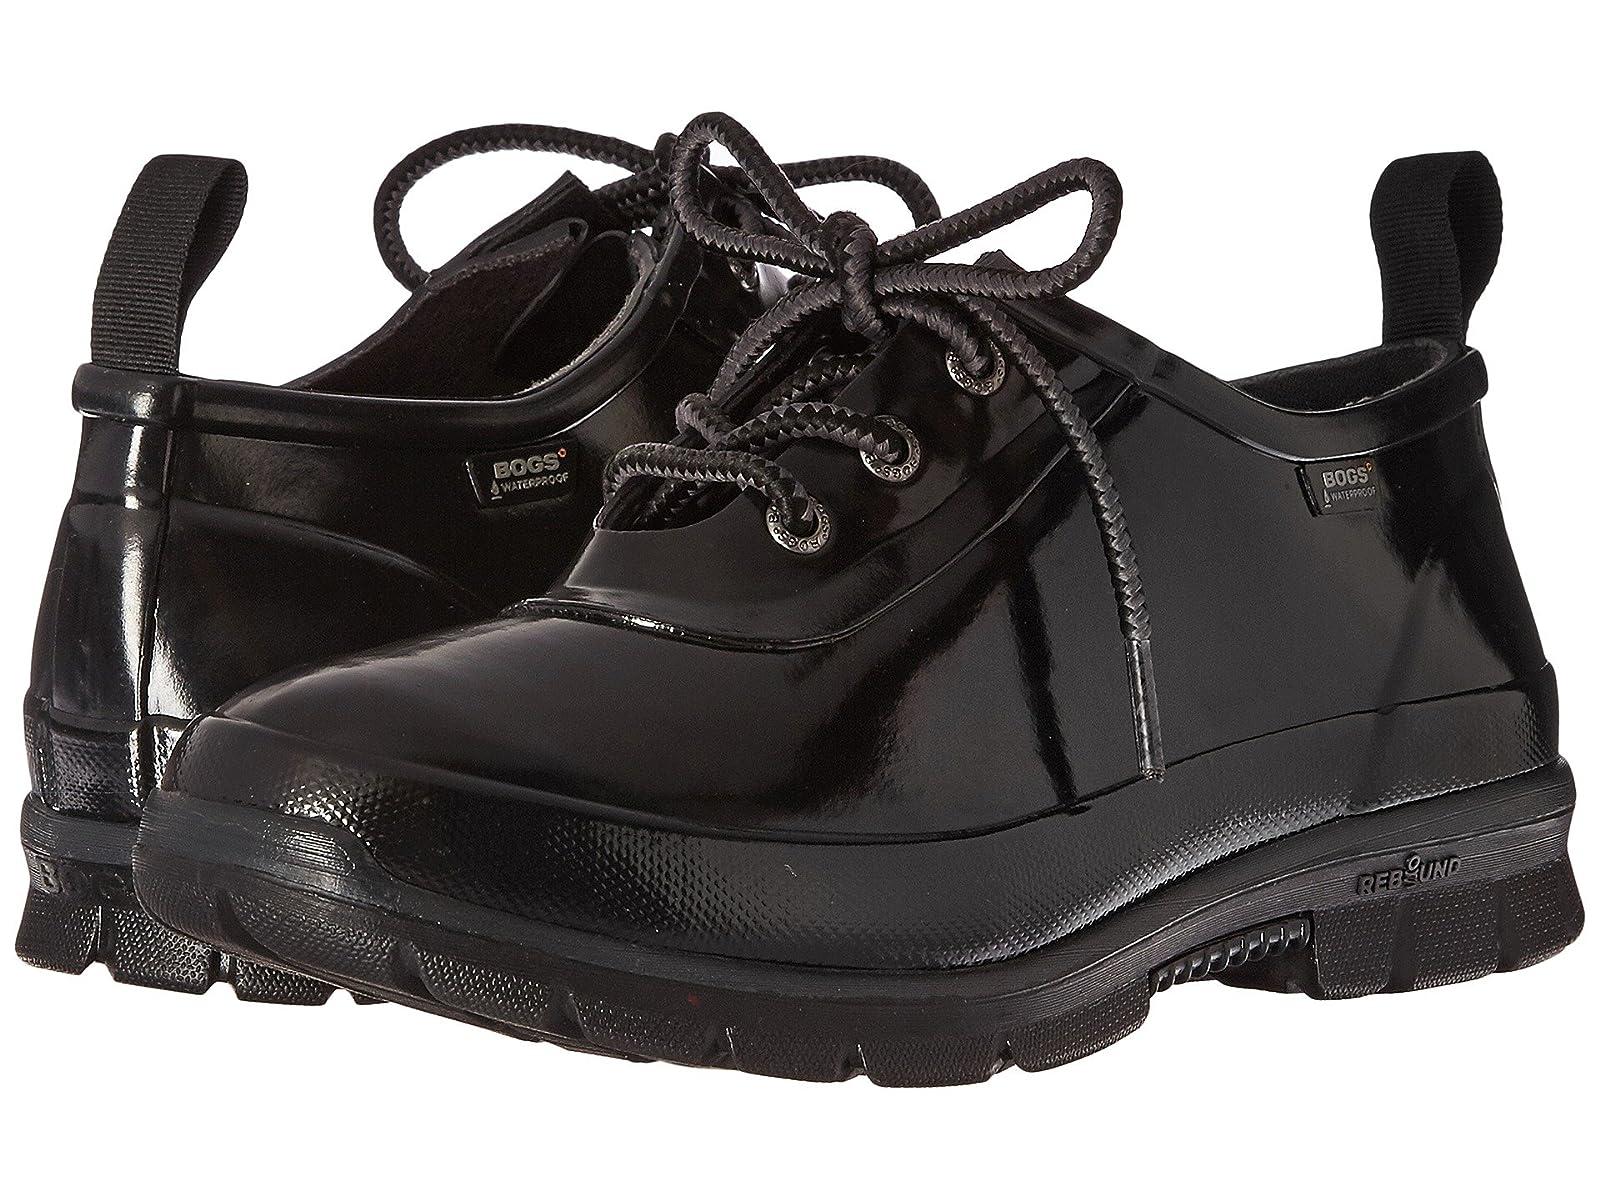 Bogs Amanda 3-Eye ShoeCheap and distinctive eye-catching shoes